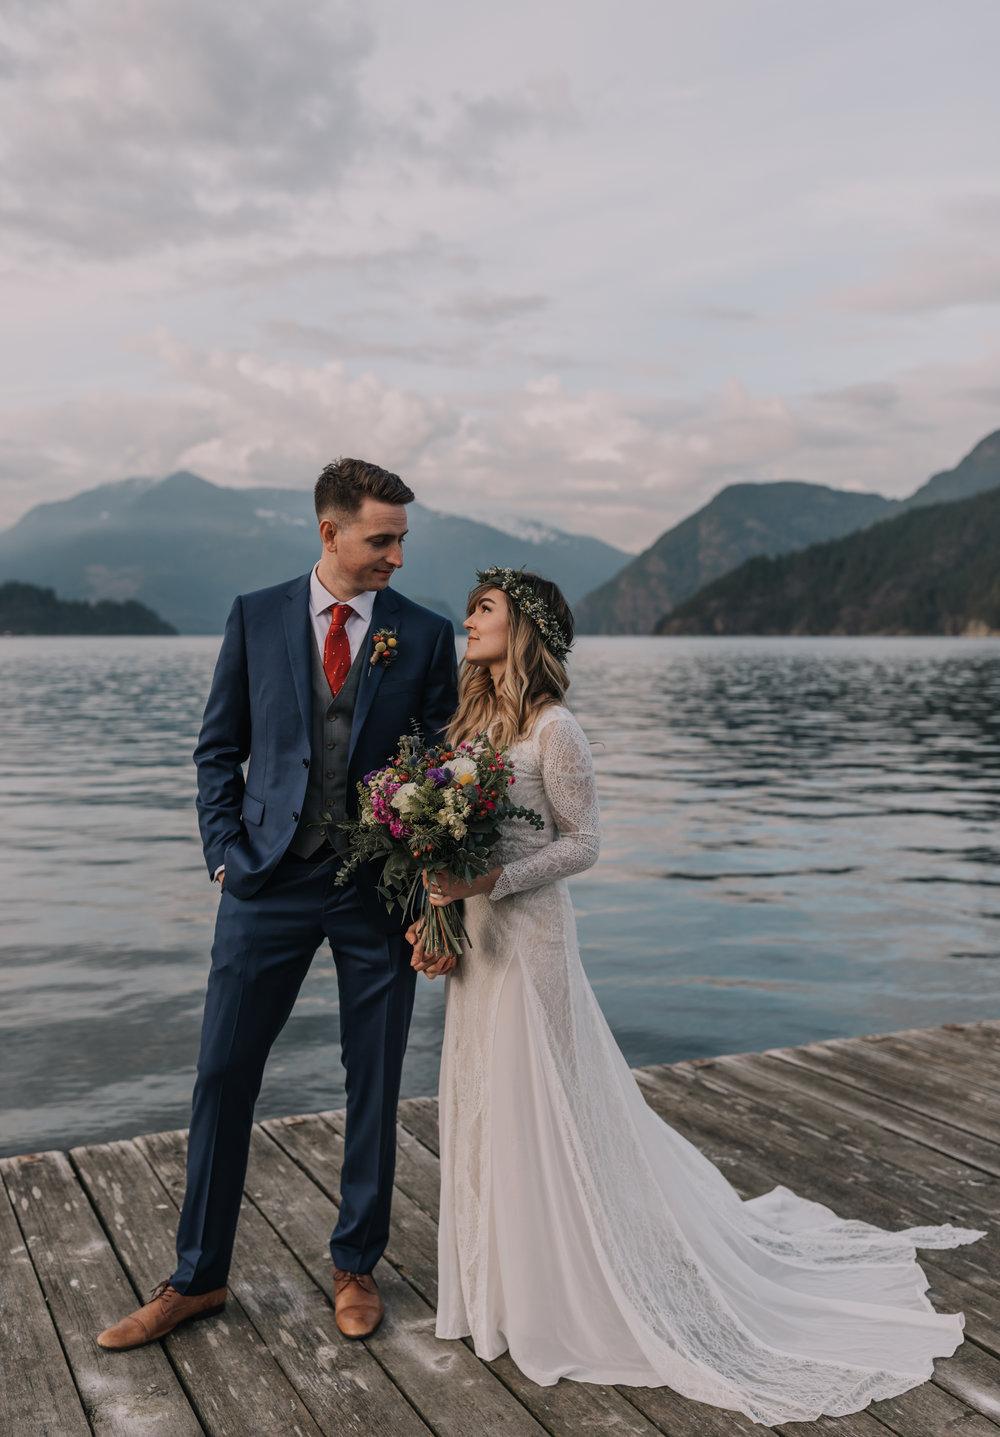 Sunshine Coast Wedding Photos - Mountain Wedding Photos - Sunshine Coast Wedding Photographer - Vancouver Wedding Photographer - Jennifer Picard145-1.JPG